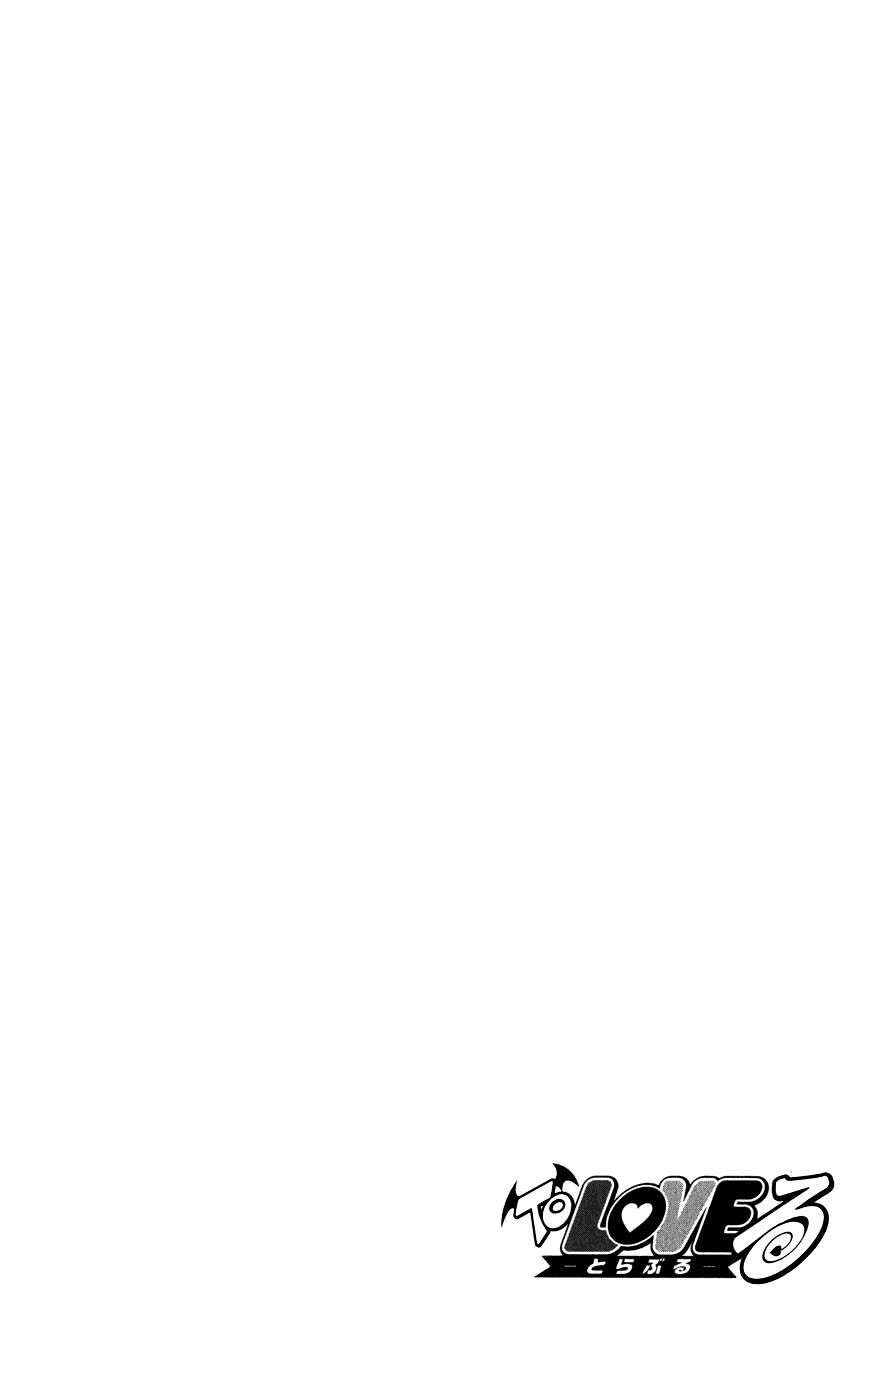 Манга Любовные неприятности / To Love-Ru  - Том 9 Глава 78 Страница 20